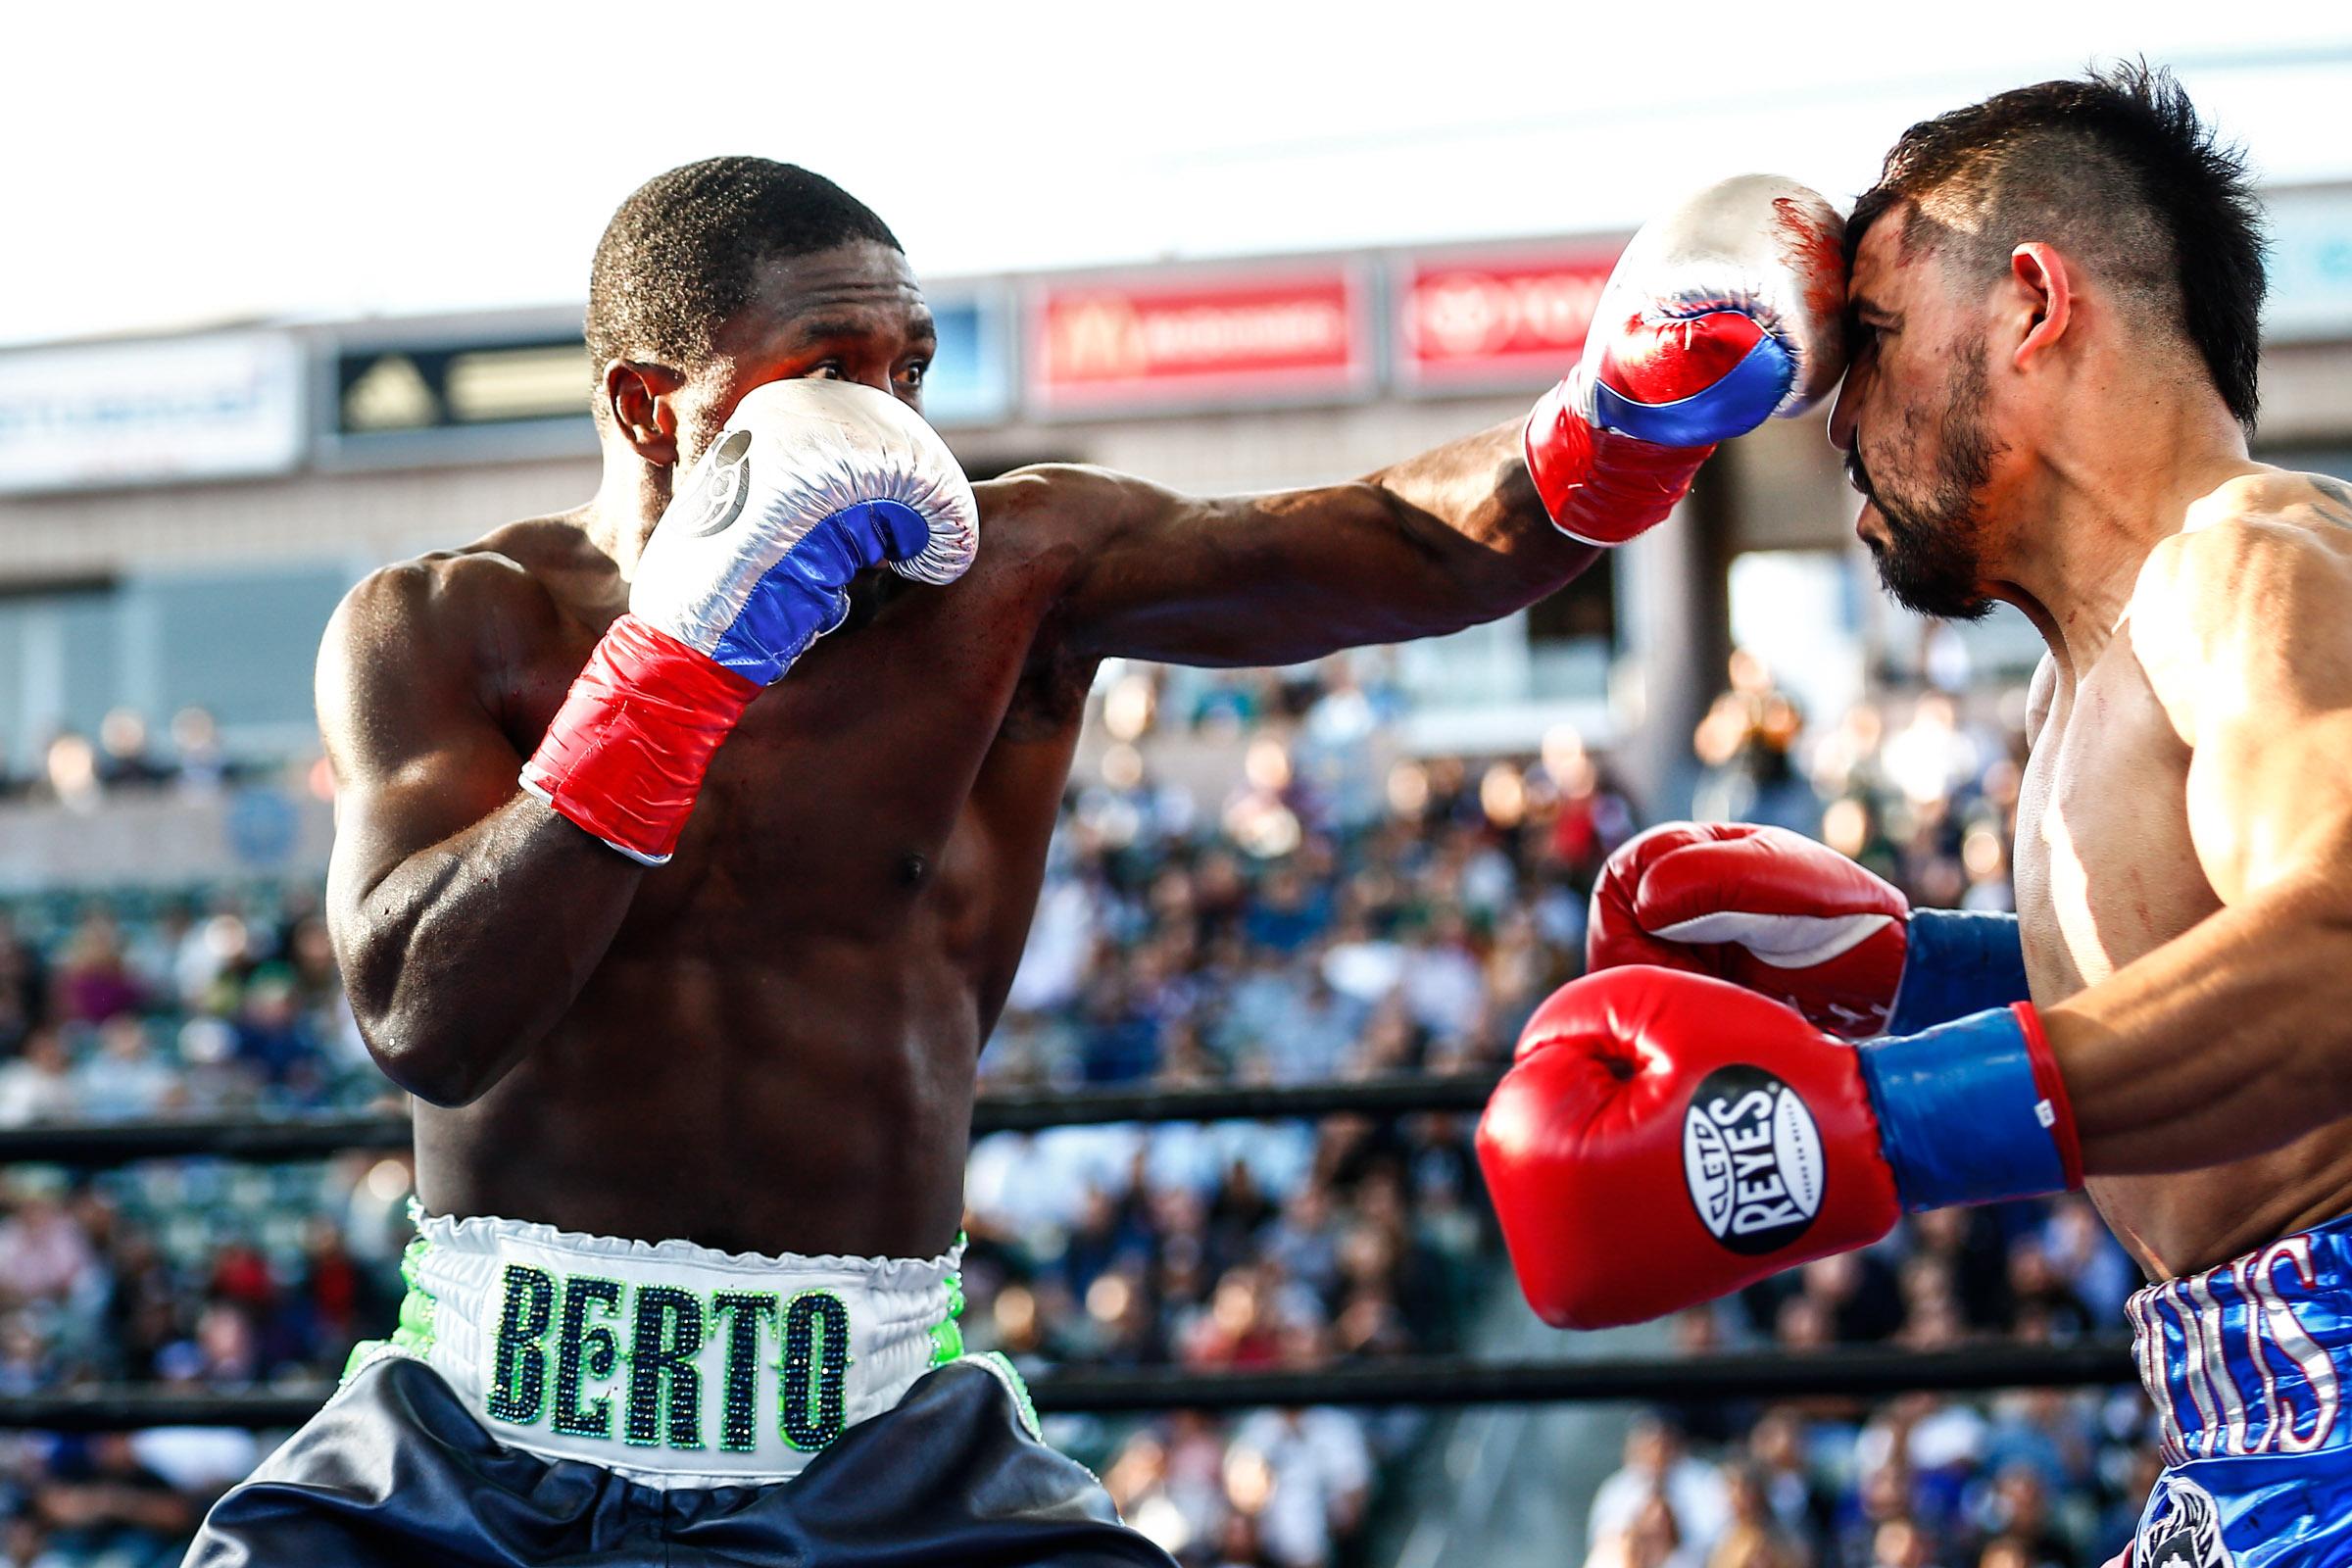 LR_BERTO VS ORTIZ-FIGHT WEEK-TRAPPFOTOS-04302016-8657.jpg